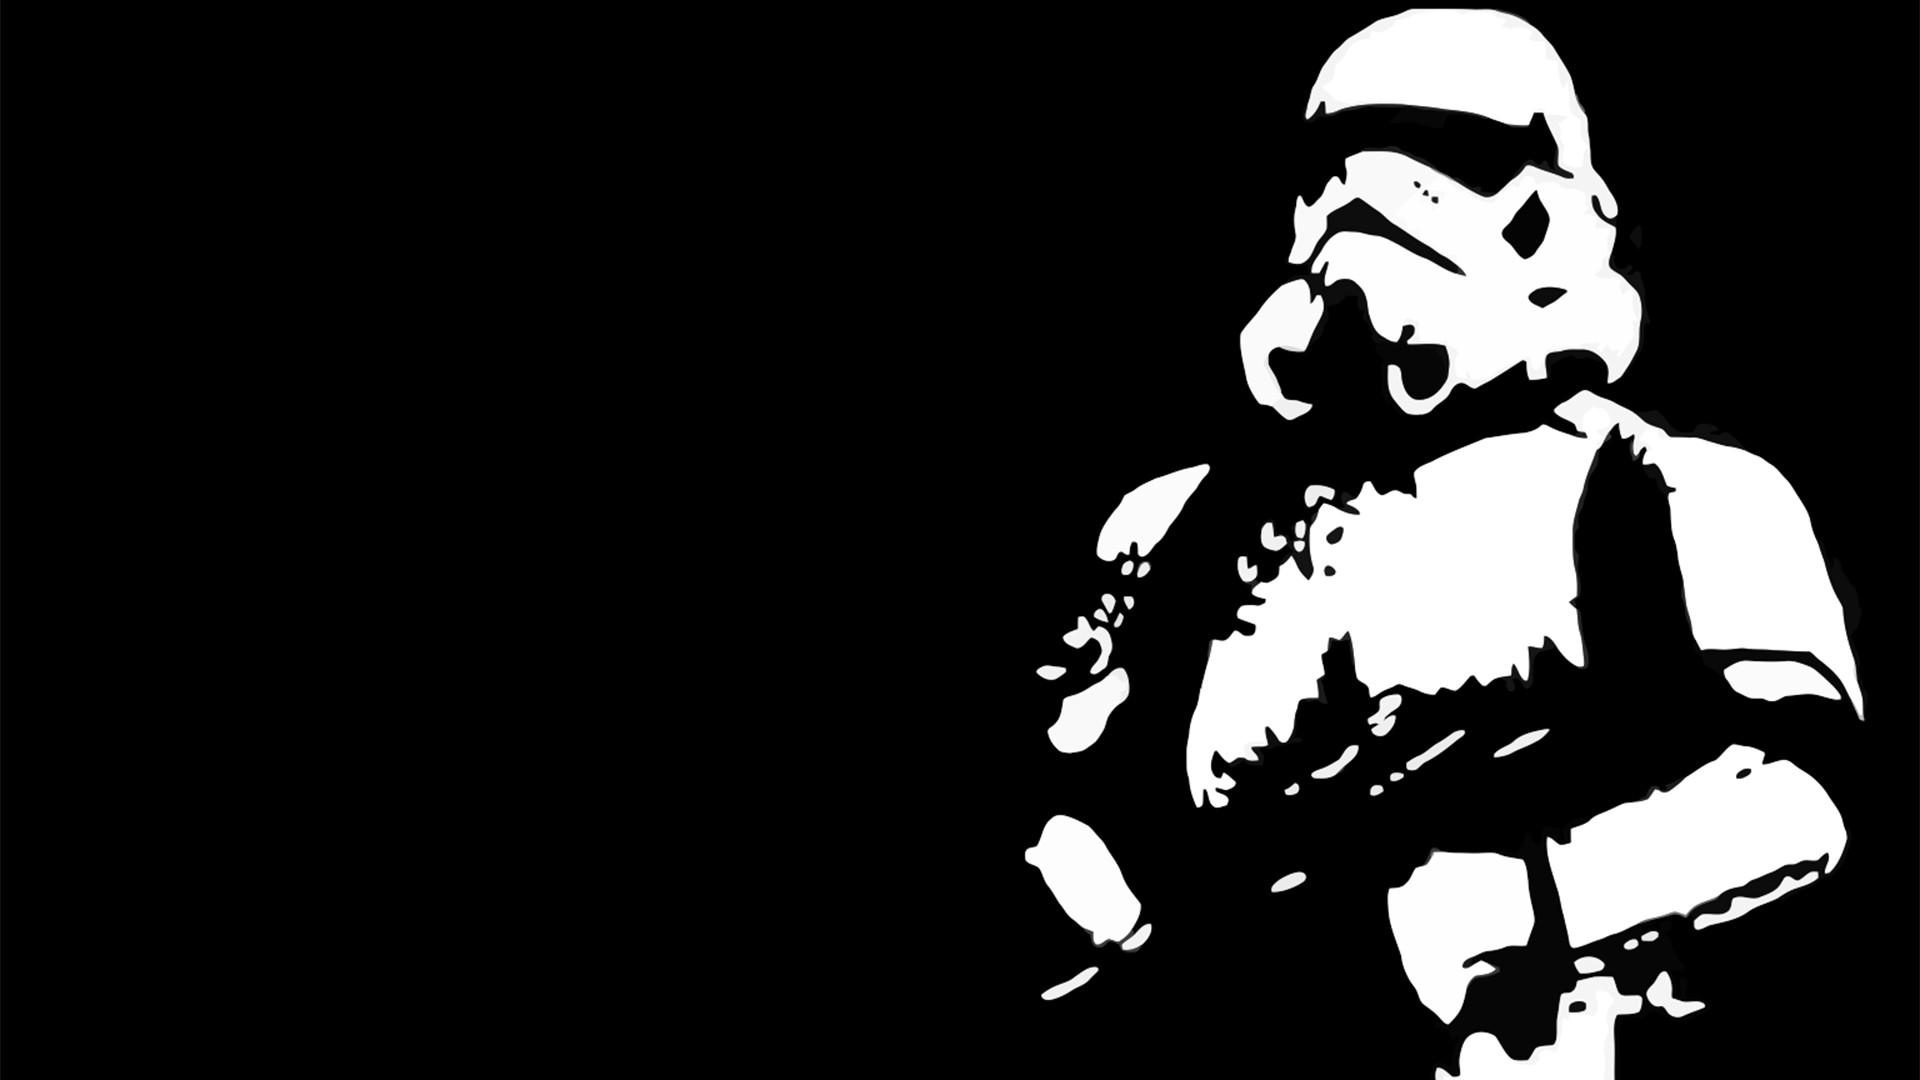 Star Wars Stormtrooper Star Wars Logo Wallpaper Hd